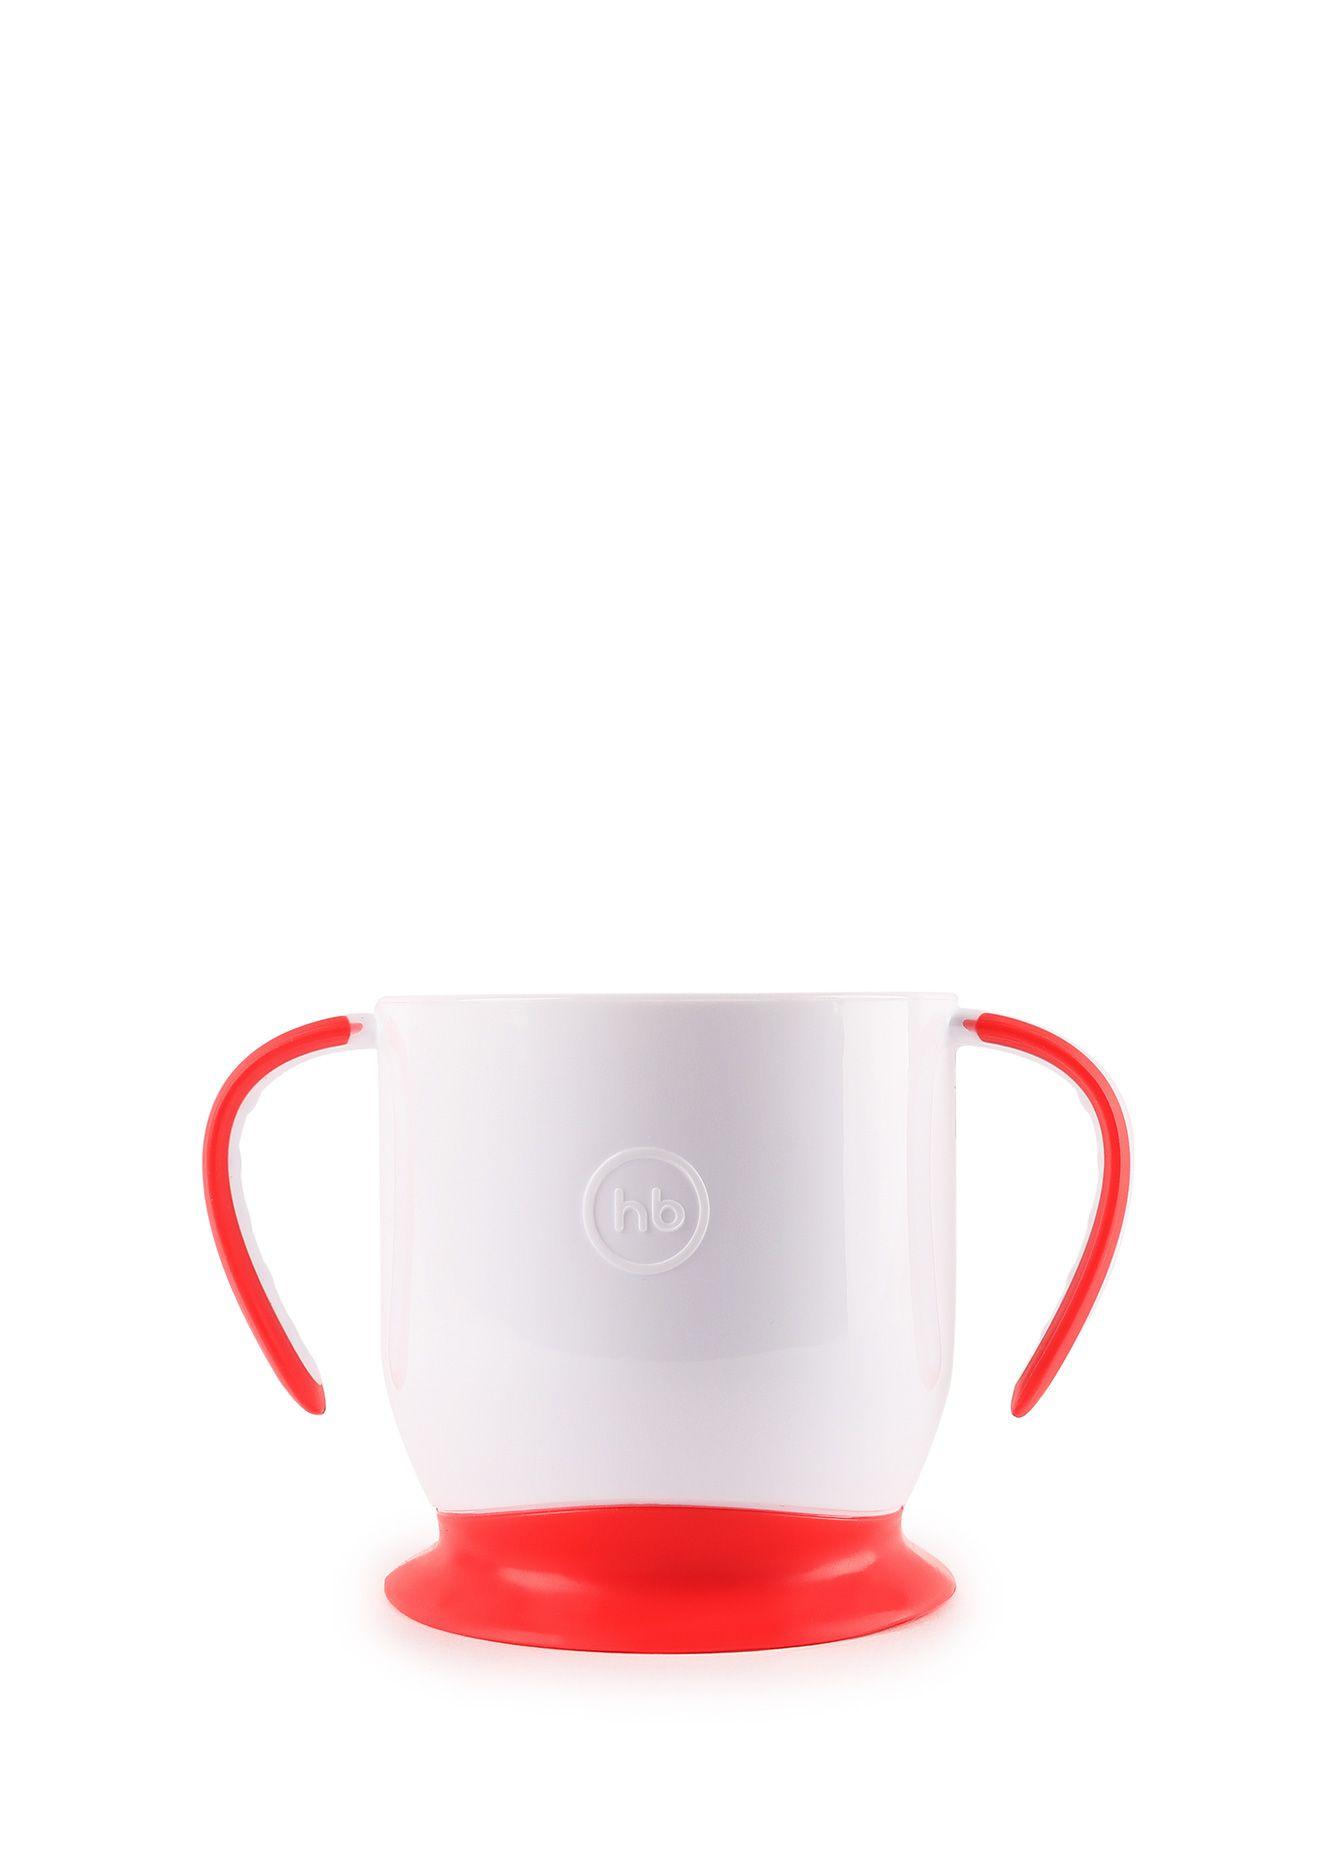 Кружка Happy Baby 15022, красный strong suction cup toothbrush frame